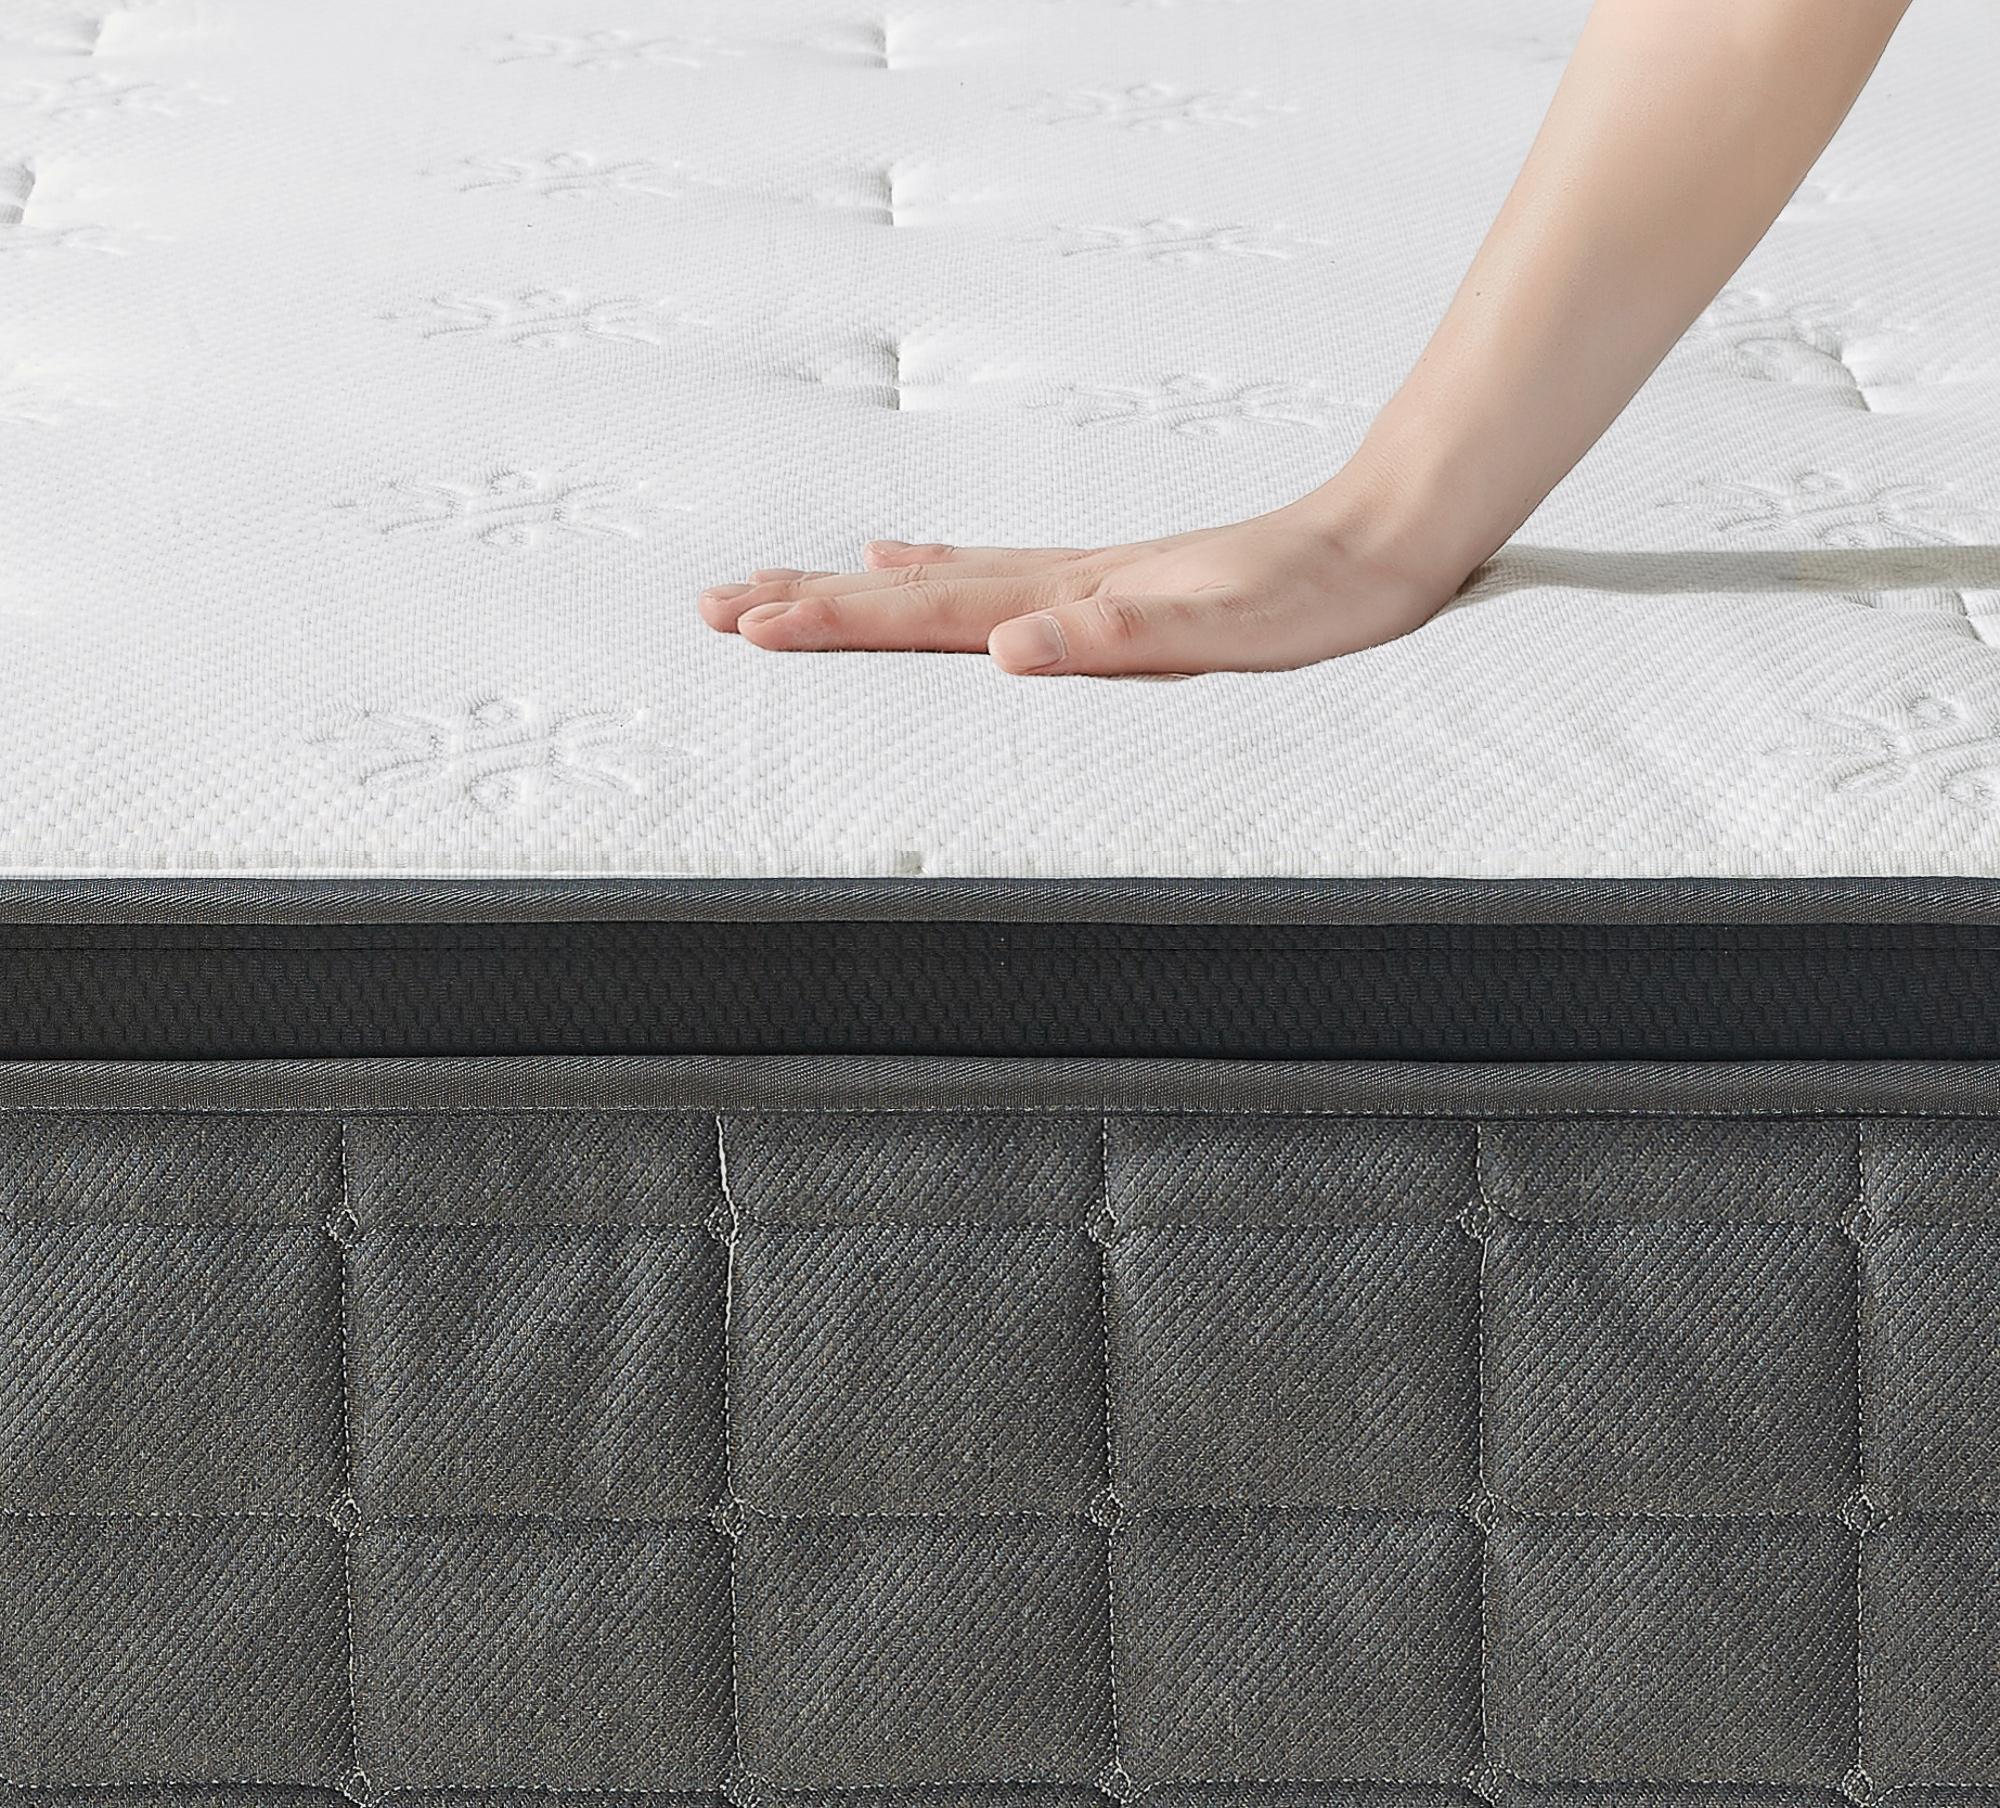 thumbnail 19 - Zinus Mattress Queen Double King Single Bed Memory Foam Pocket Spring Hybrid